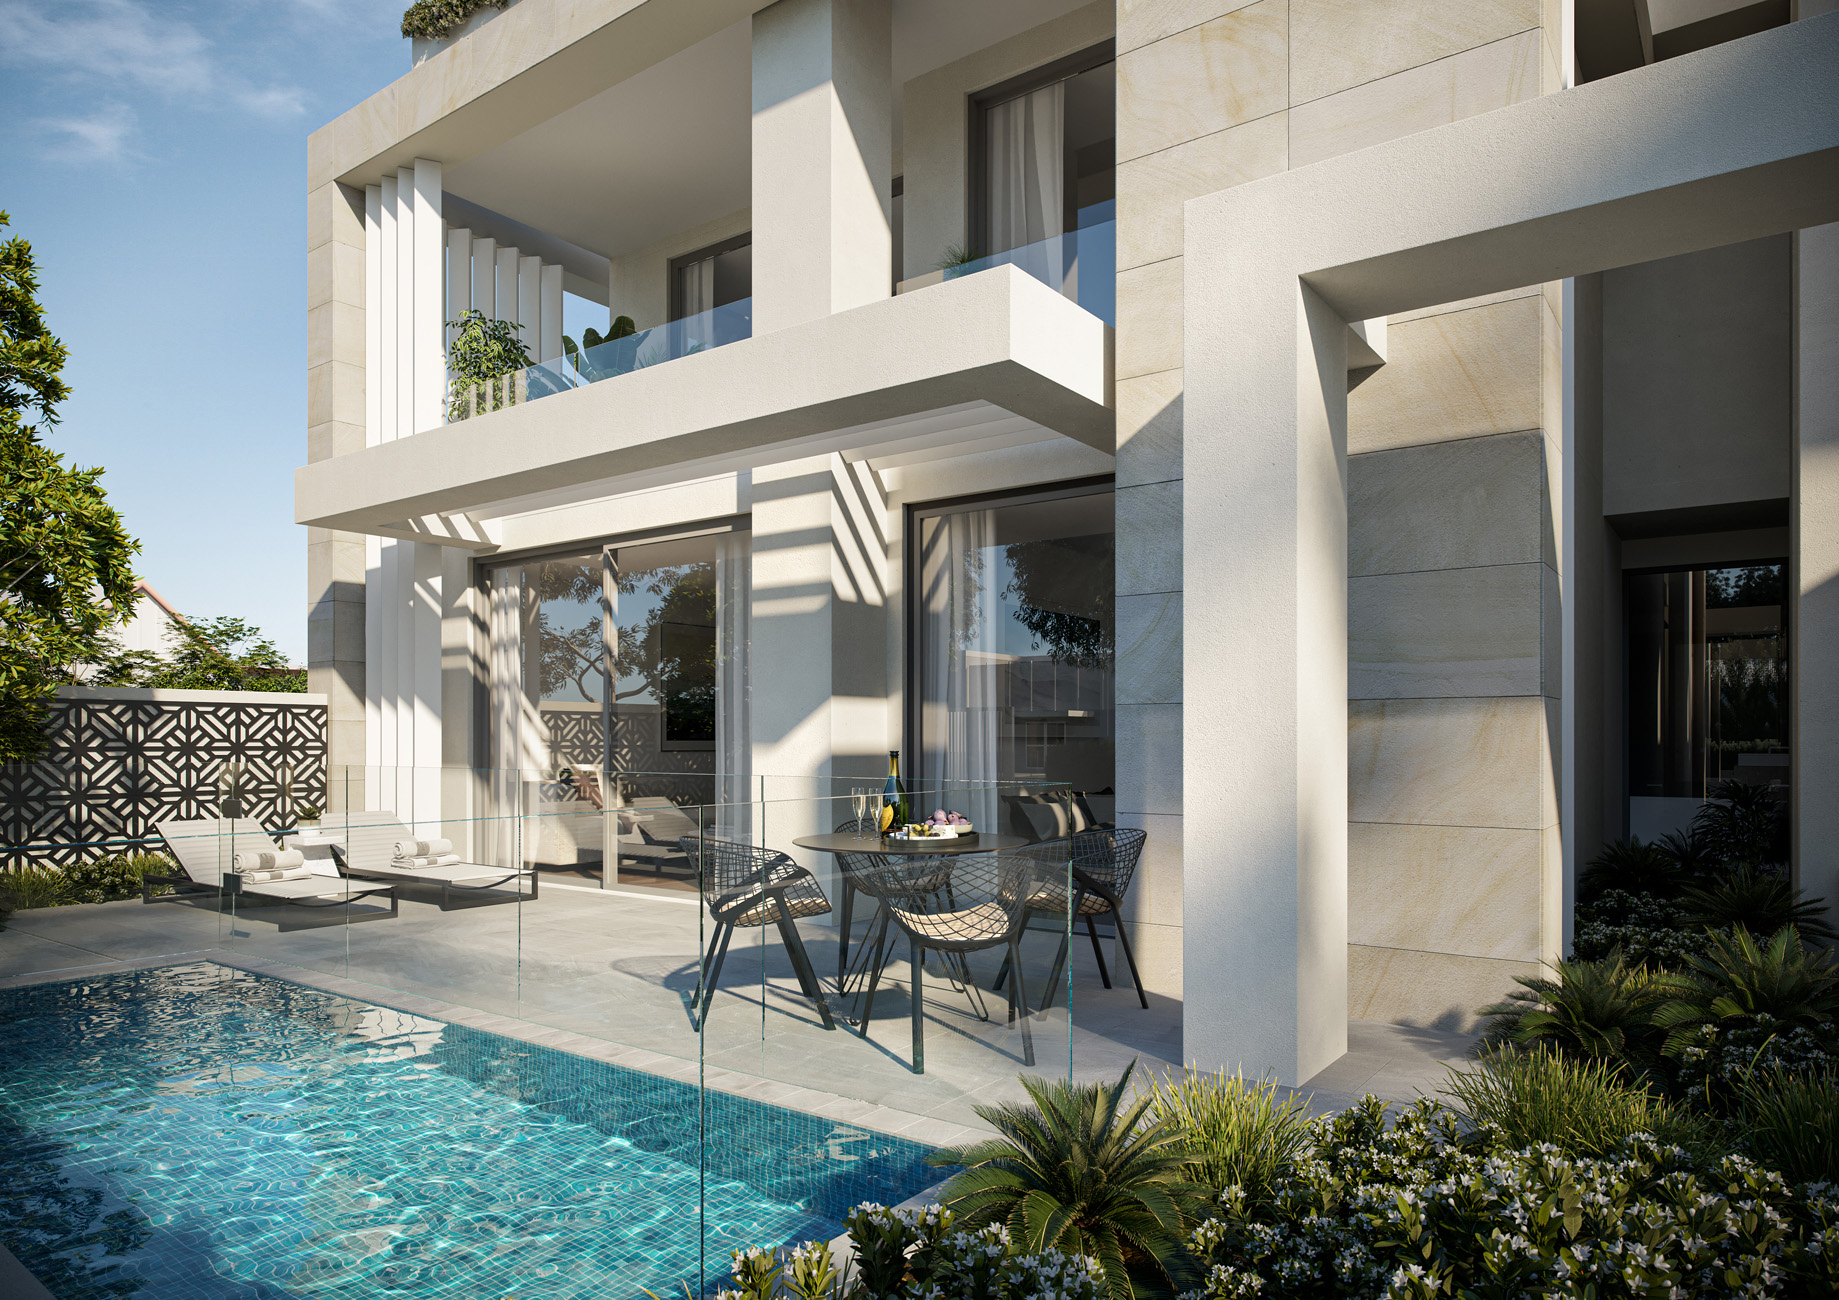 Trentham-House-courtyard-sandringham-Melbourne-3d-image-visualisation